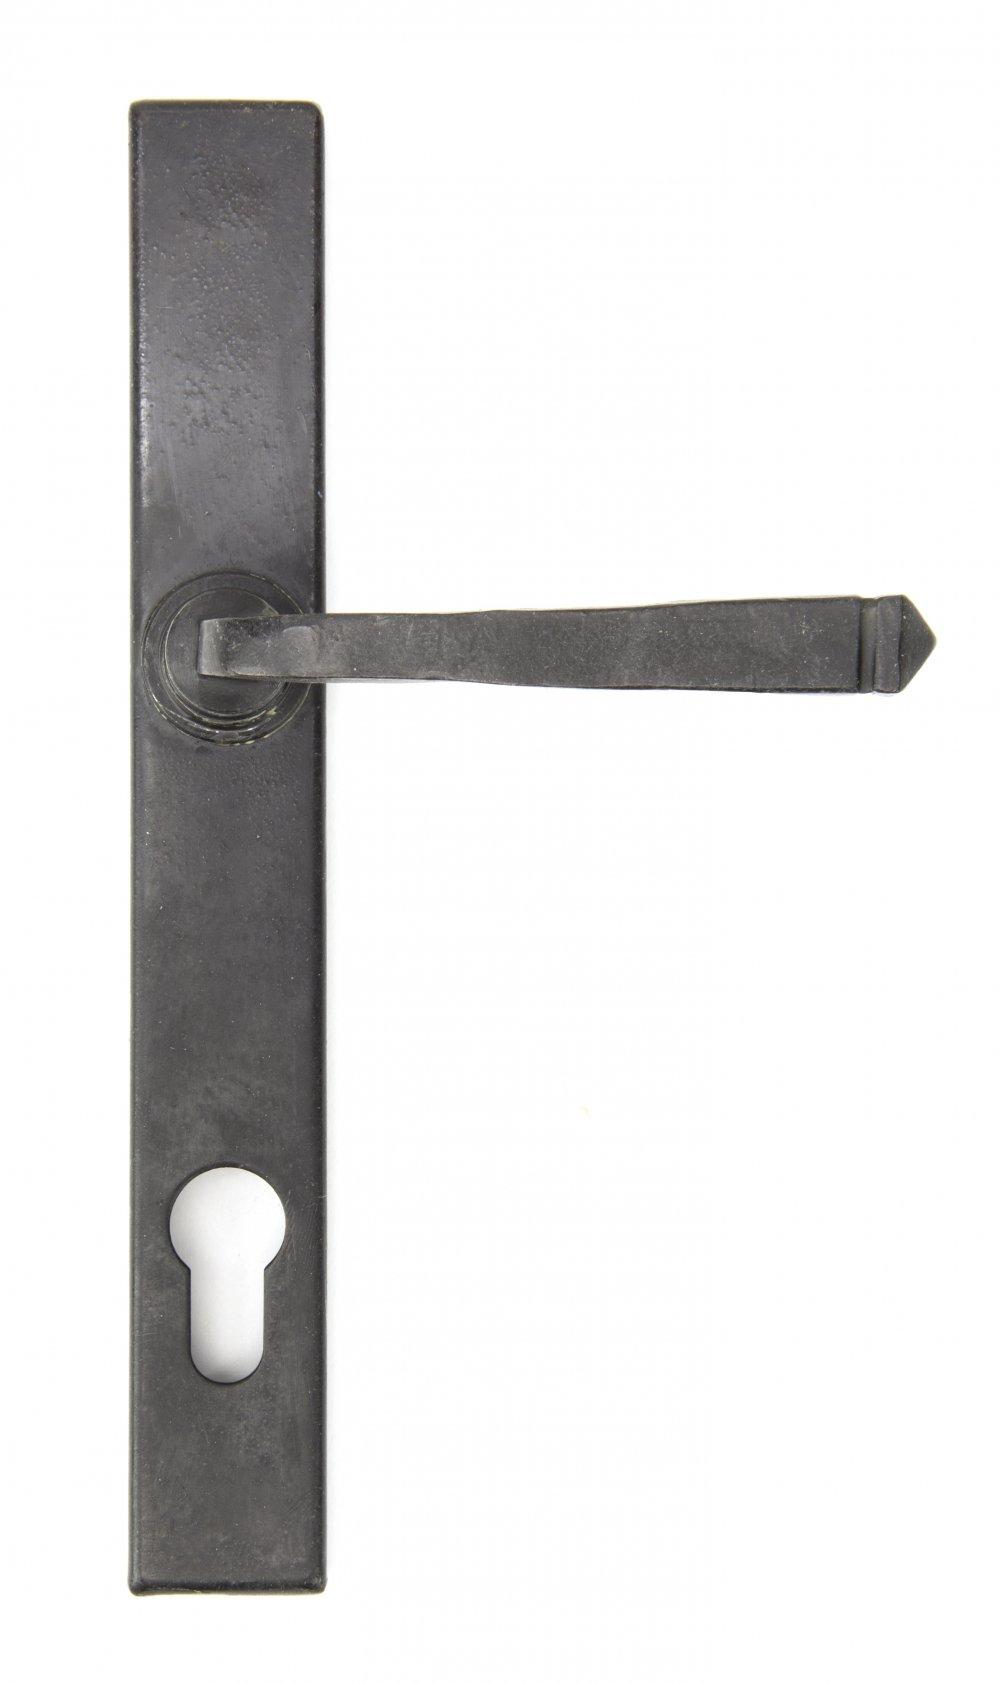 External Beeswax Avon Slimline Lever Espag. Lock Set image